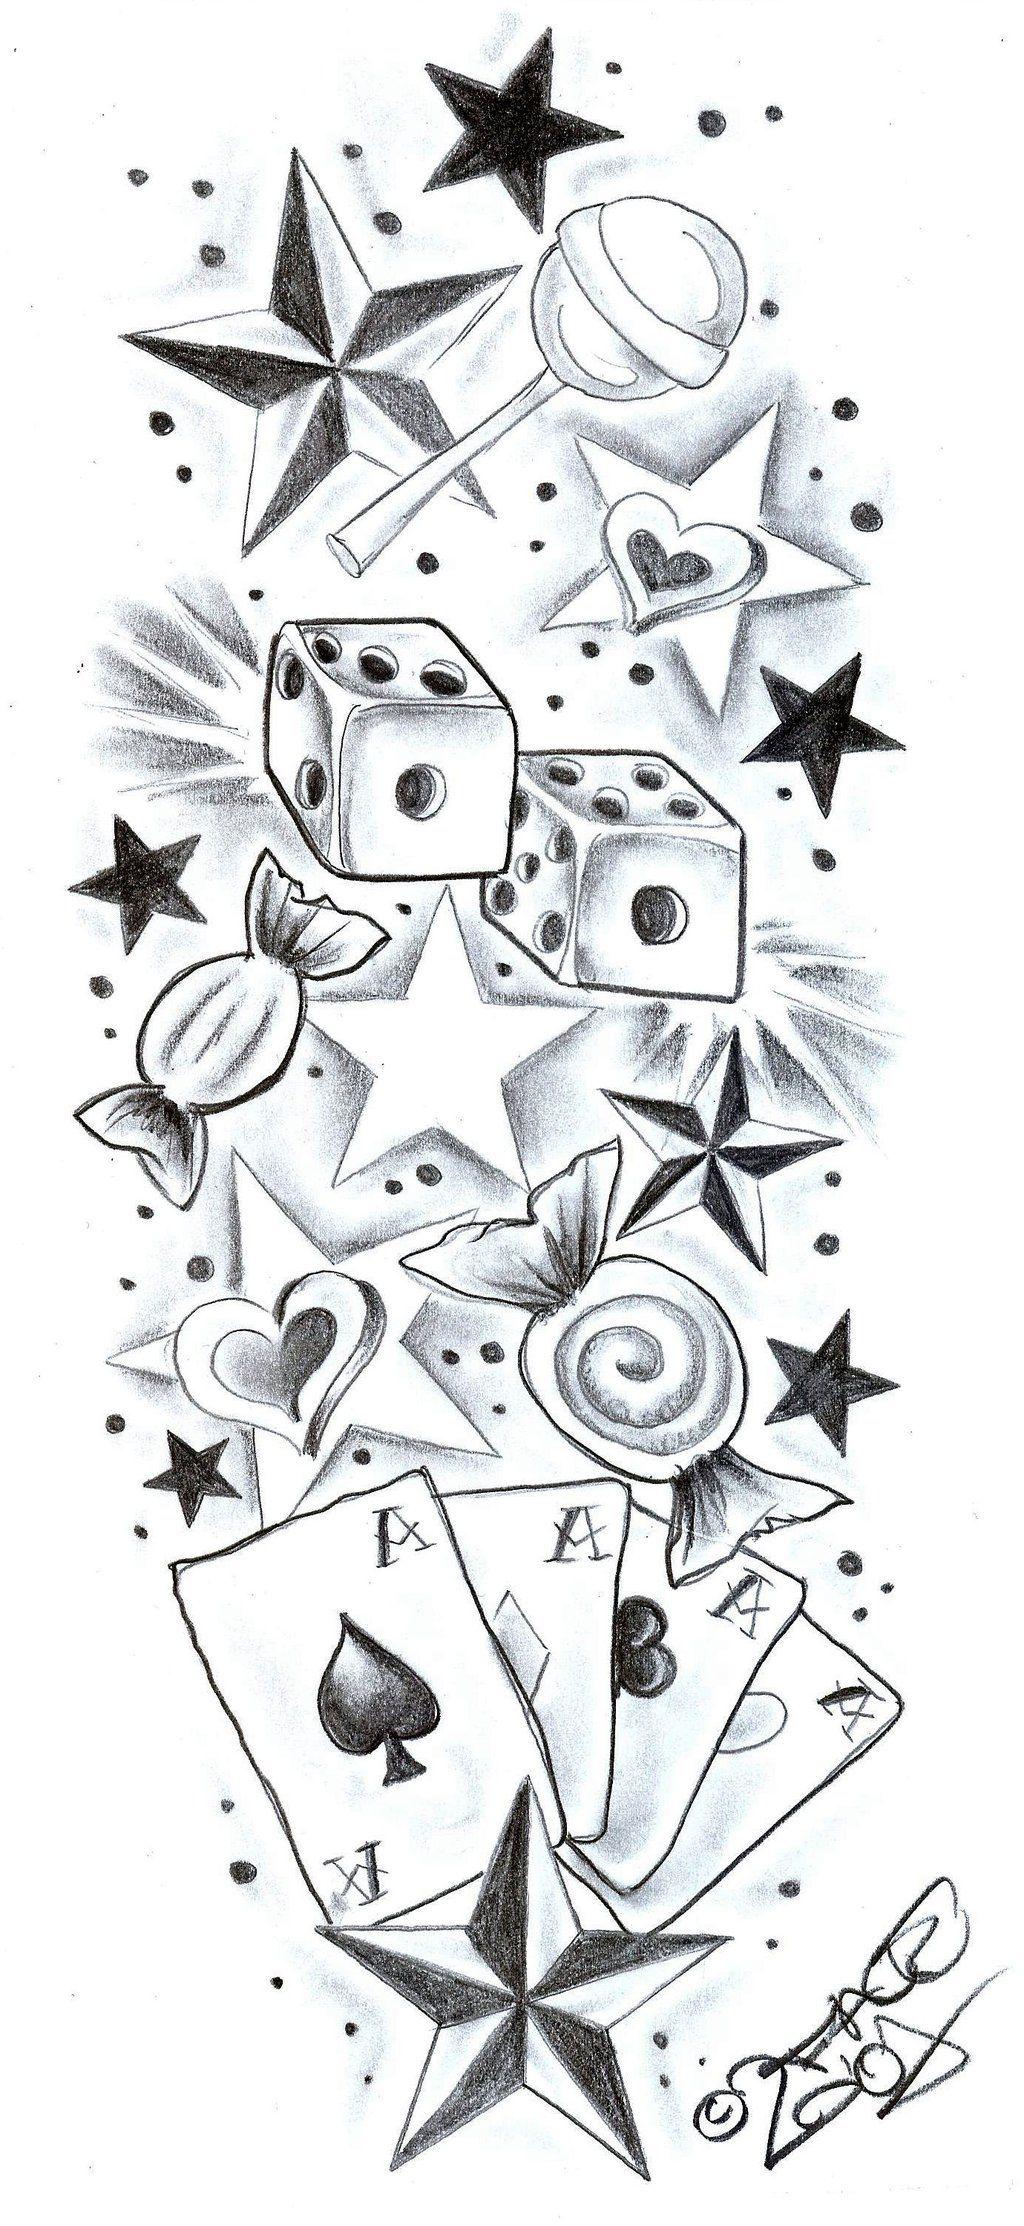 Tattoodesign Sweetscherrystars By 2face Tattoo On Deviantart Tattoo Design Drawings Tattoo Sketches Deviantart Tattoo